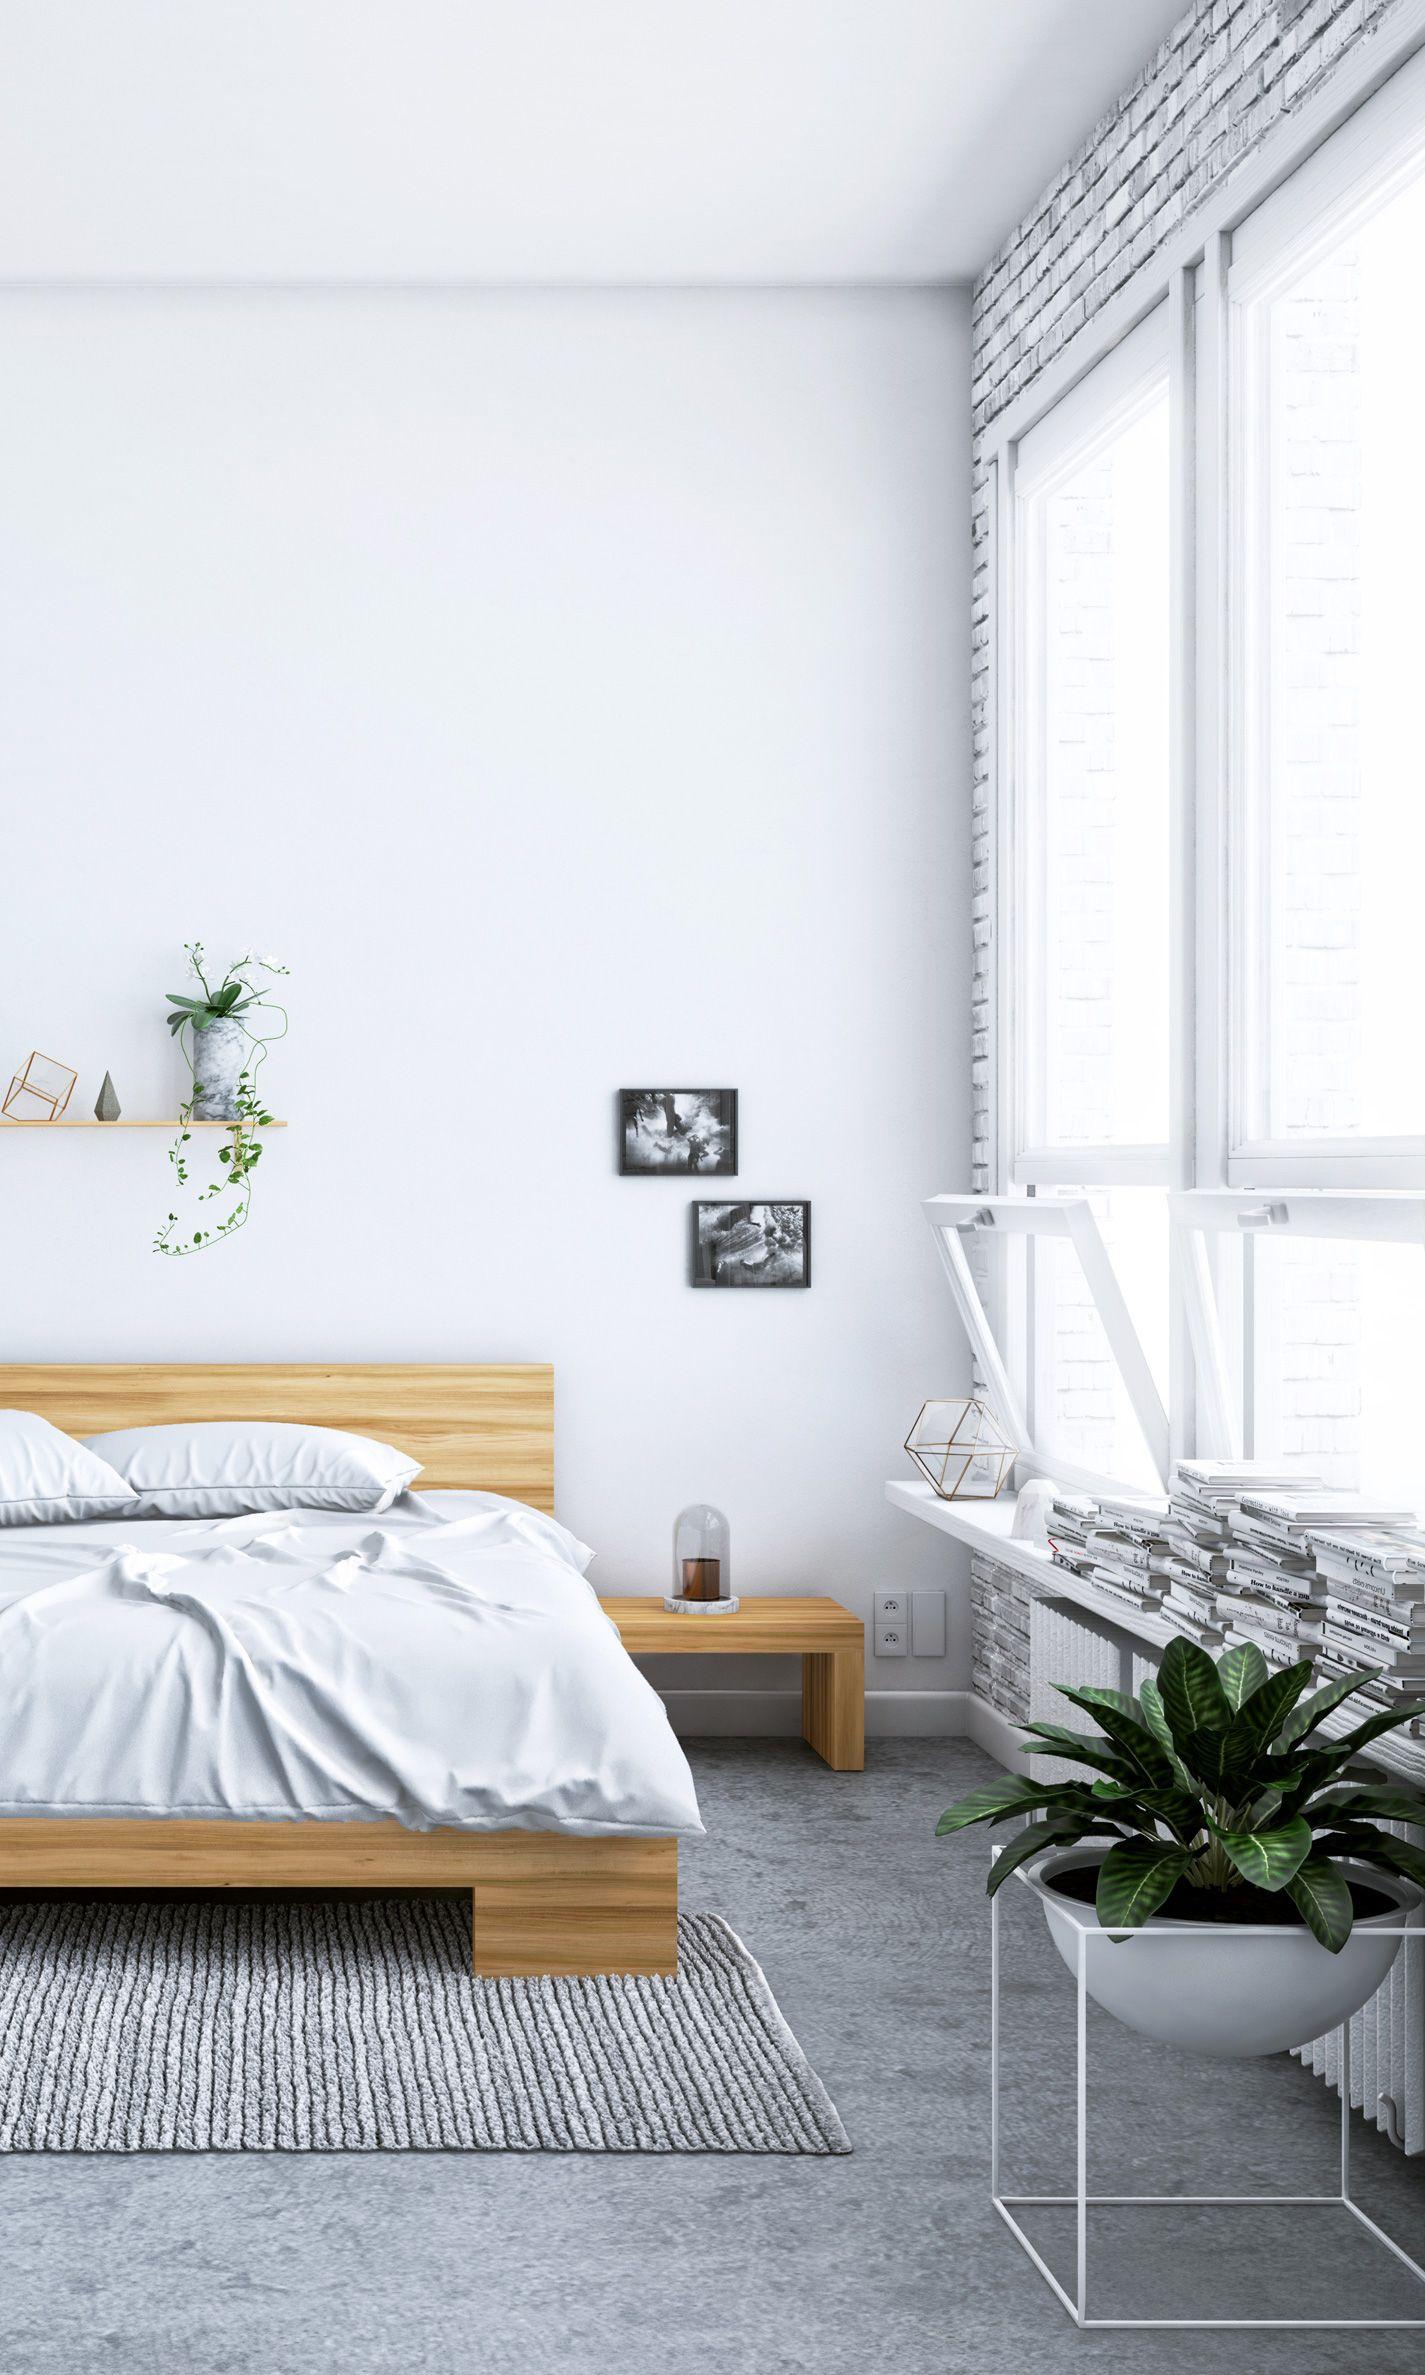 Teenage loft bedroom designs  Fredrik Bed  Rove Concepts Kure MidCentury Furniture  Sleep